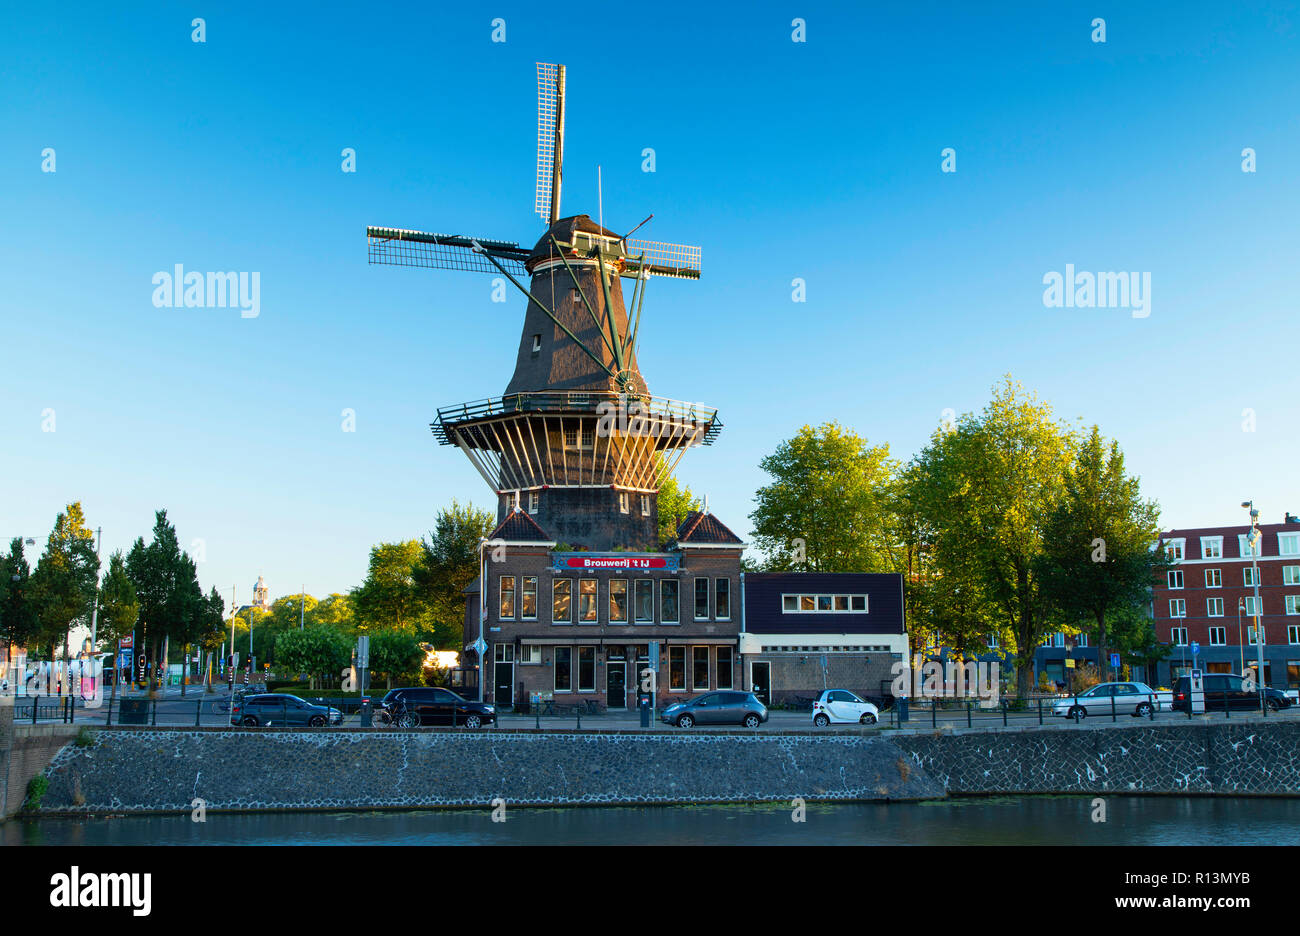 De Gooyer windmil, Amsterdam, Noord Holland, Netherlands - Stock Image